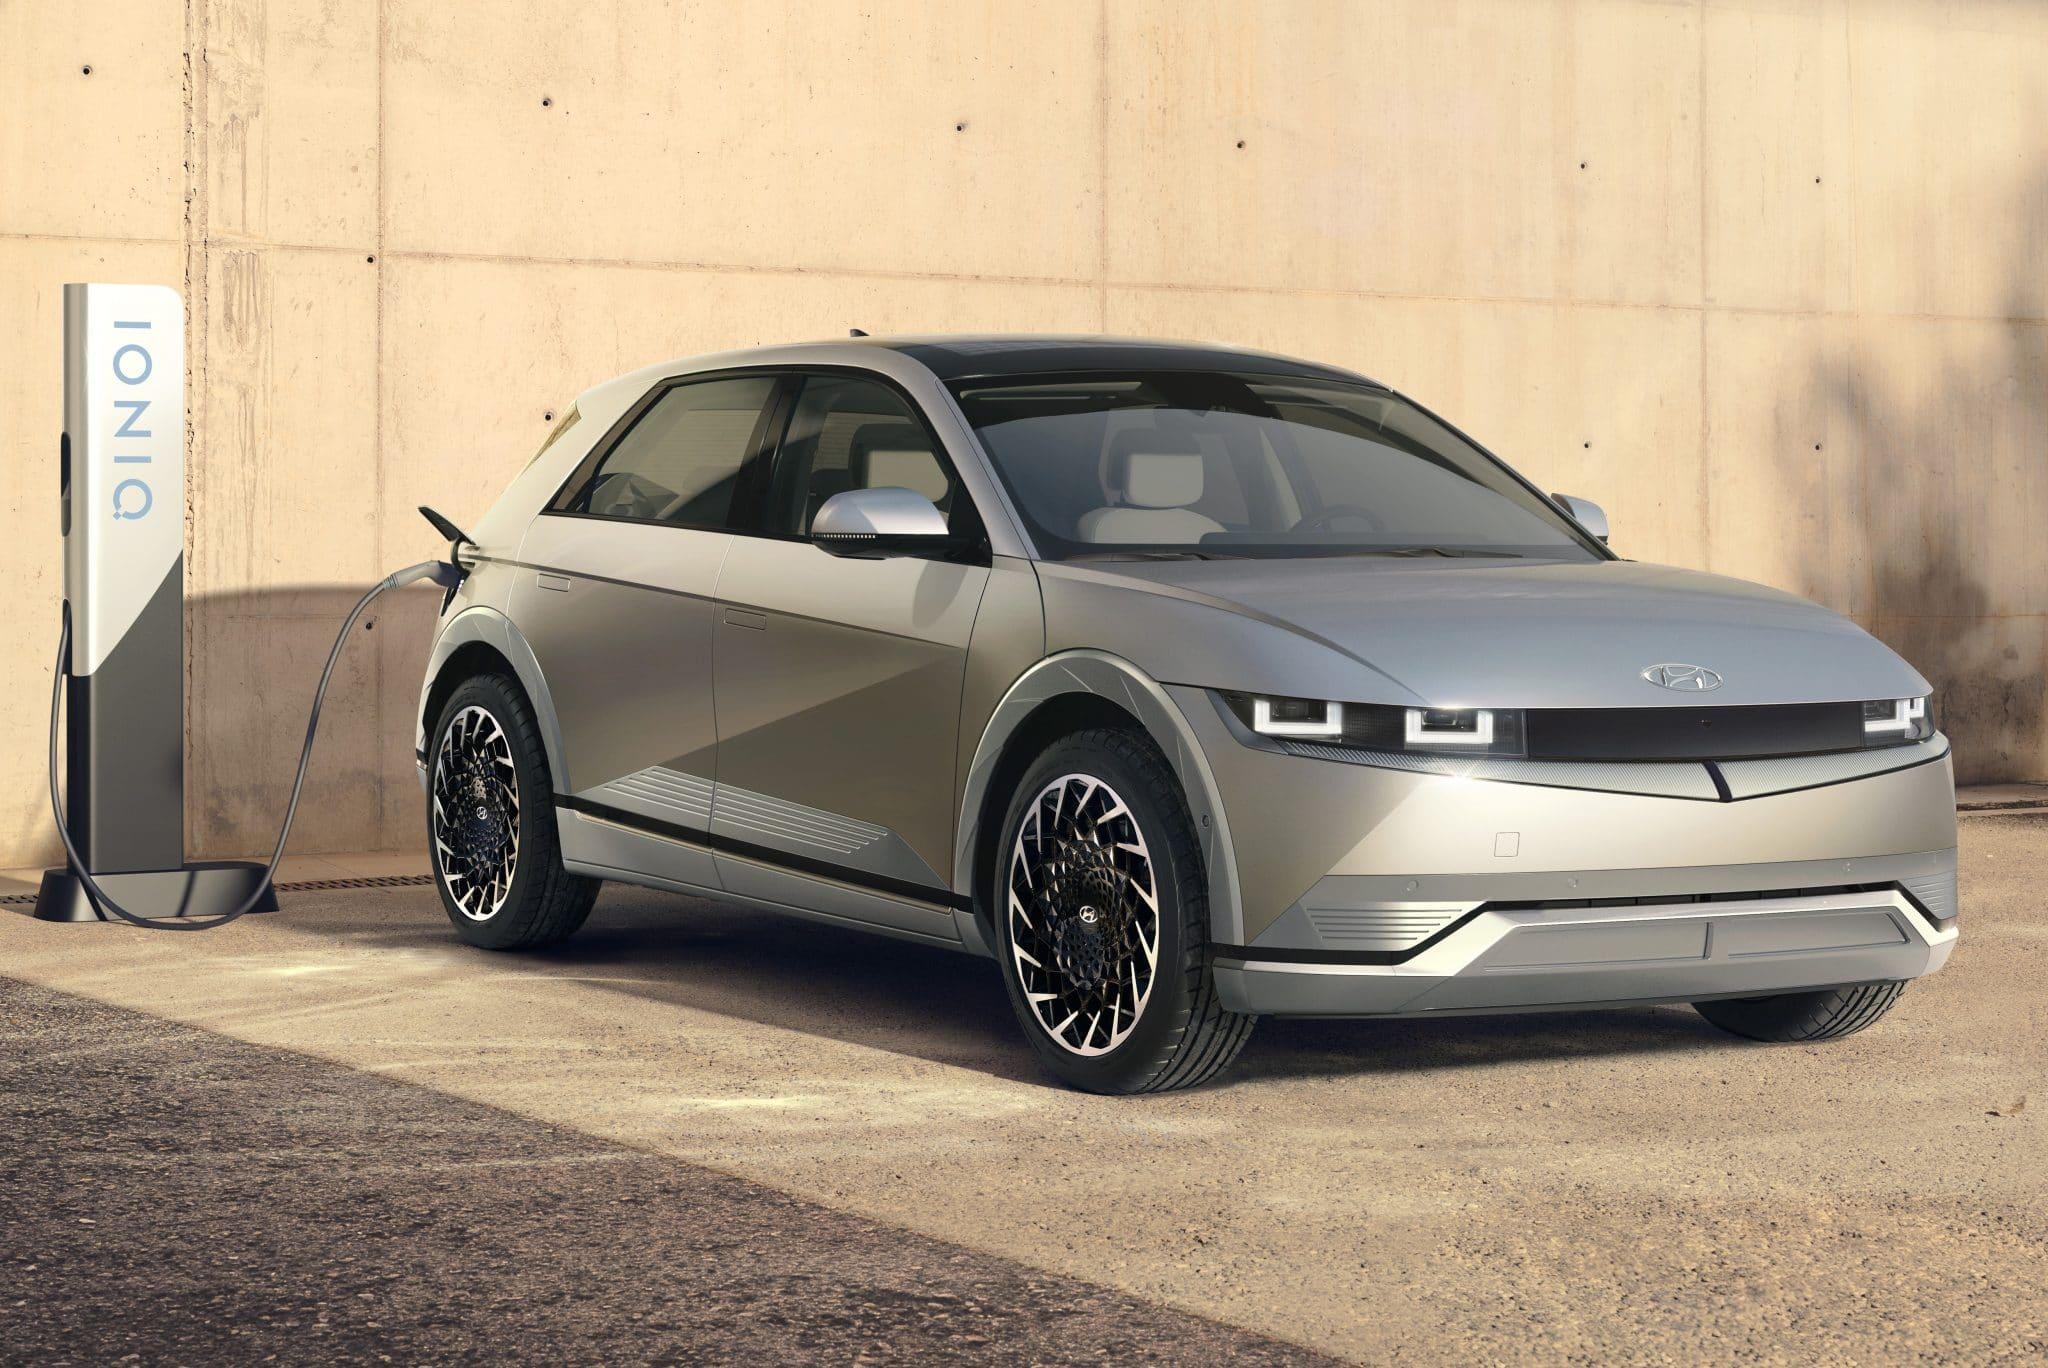 Hyundai Ioniq 5, un SUV électrique